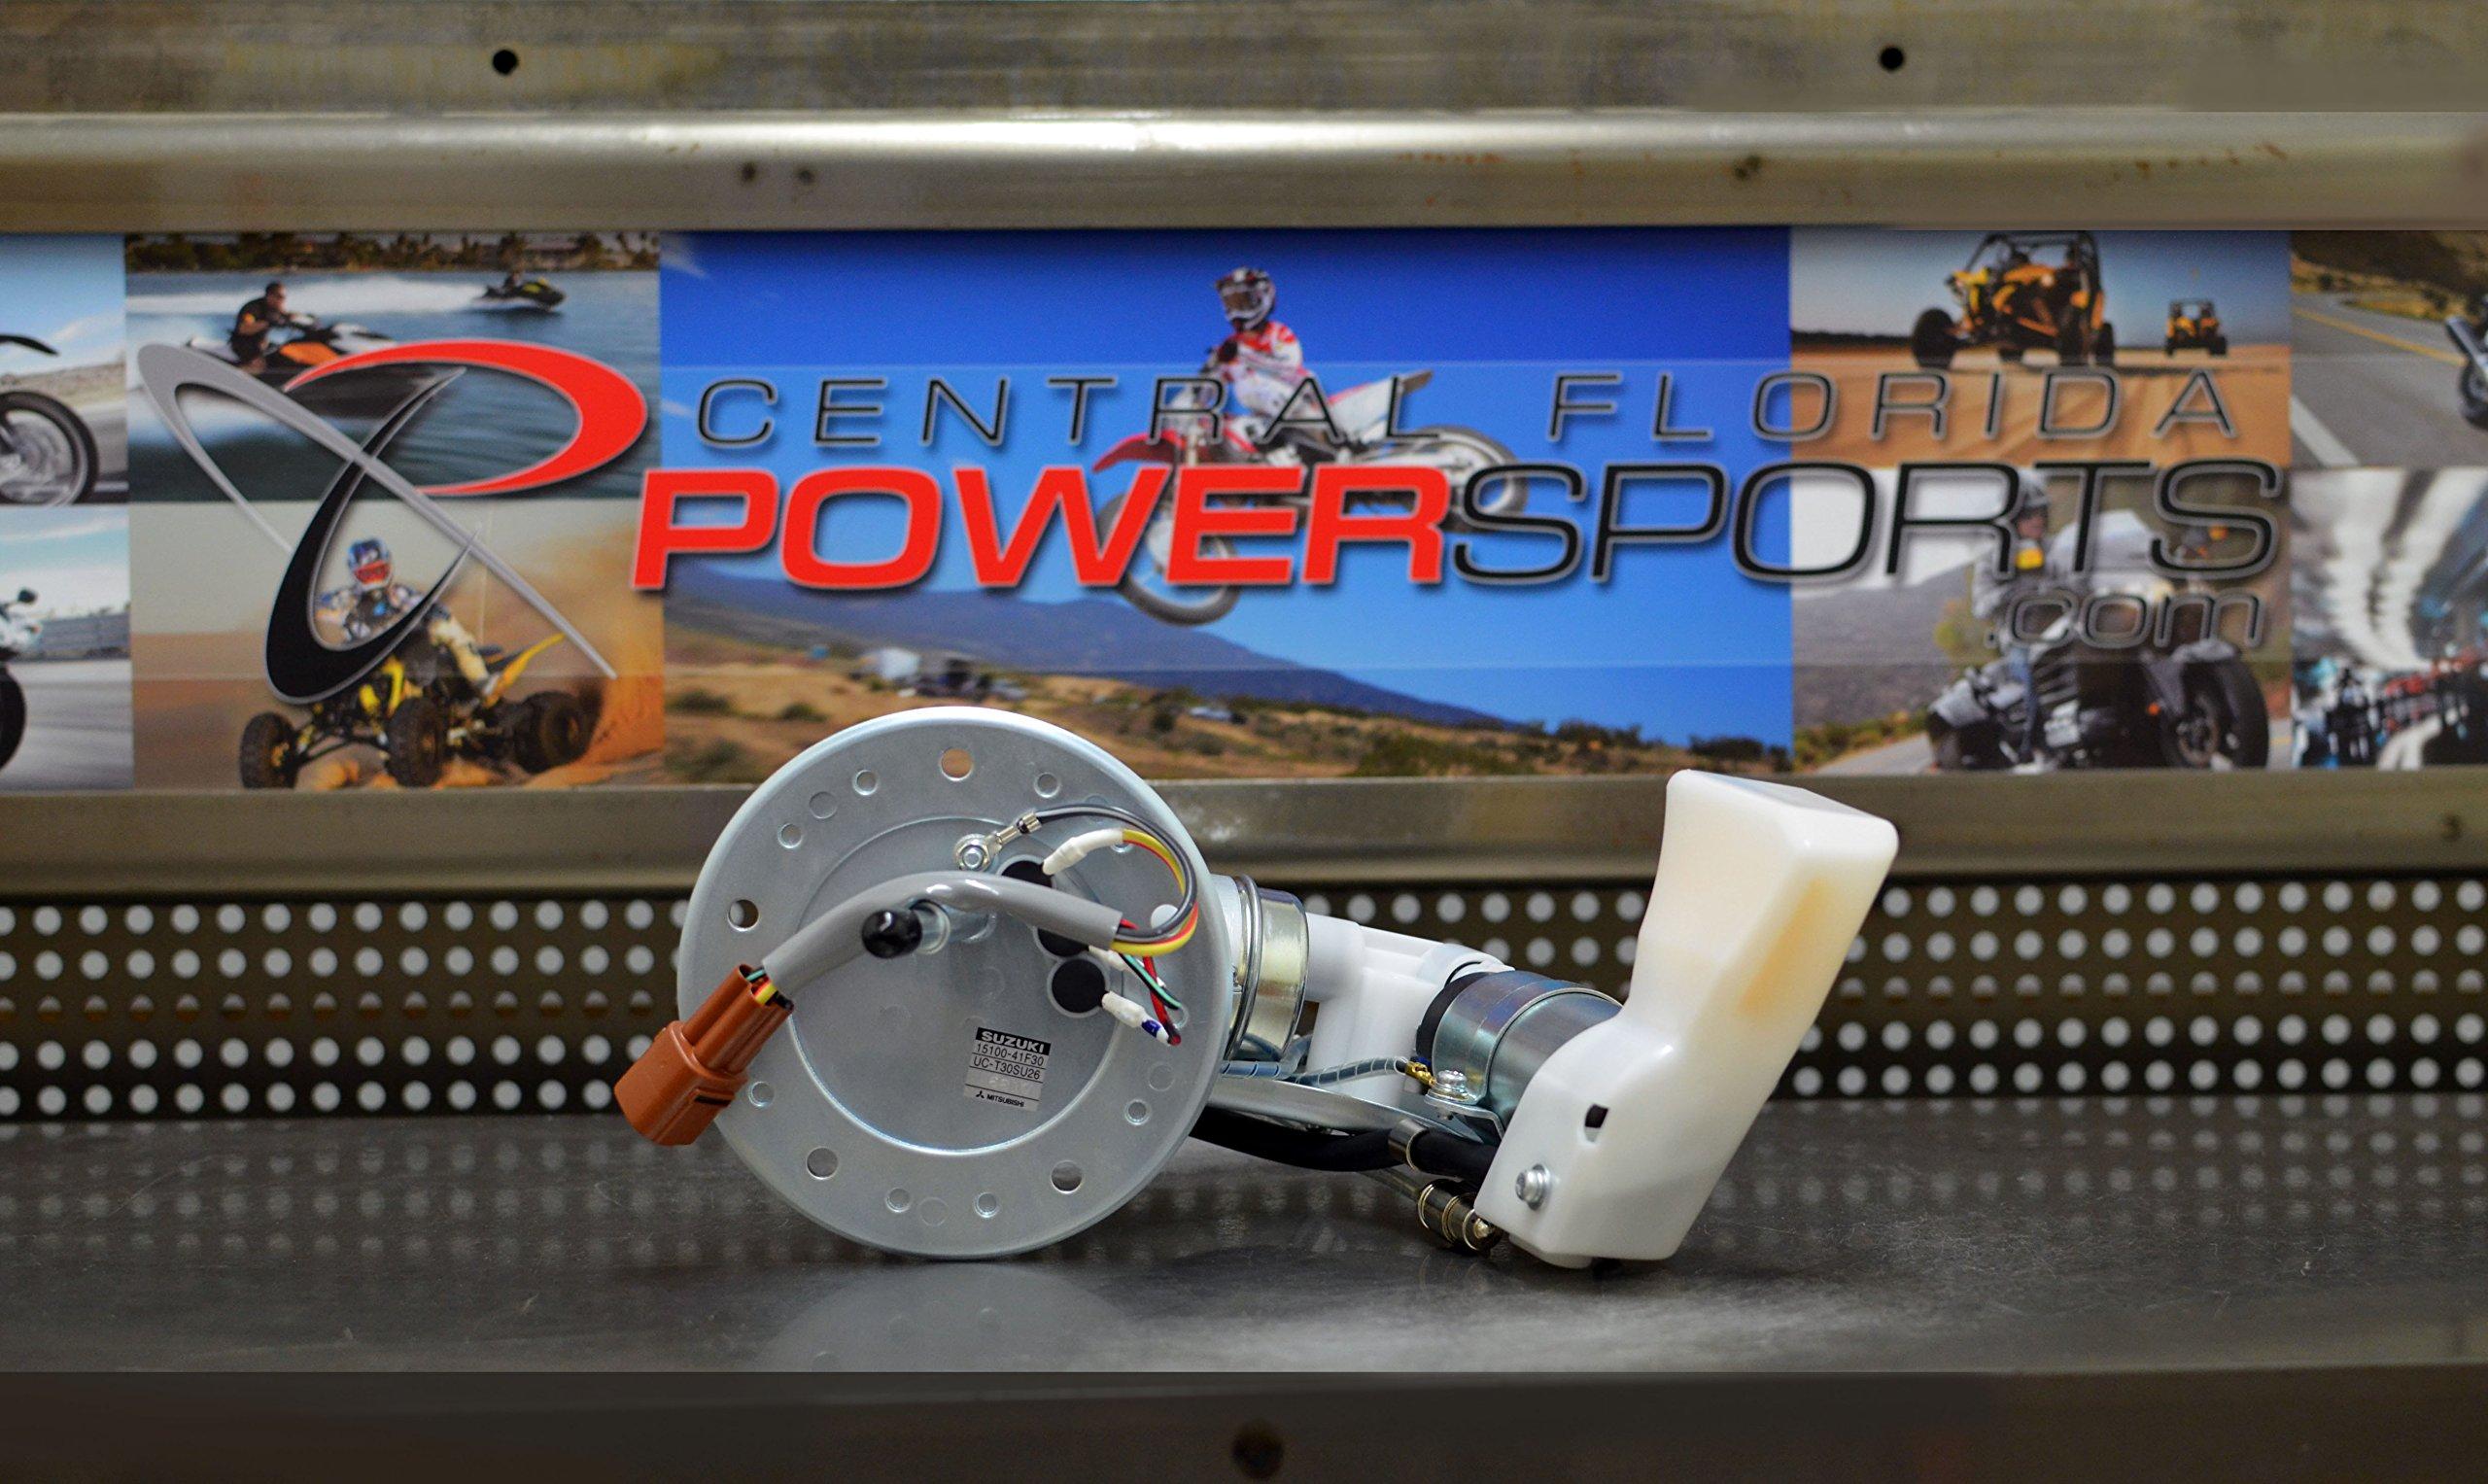 NEW Genuine Suzuki Fuel Pump Assembly Boulevard C50 VL800 C 2006-2015 15100-41F30